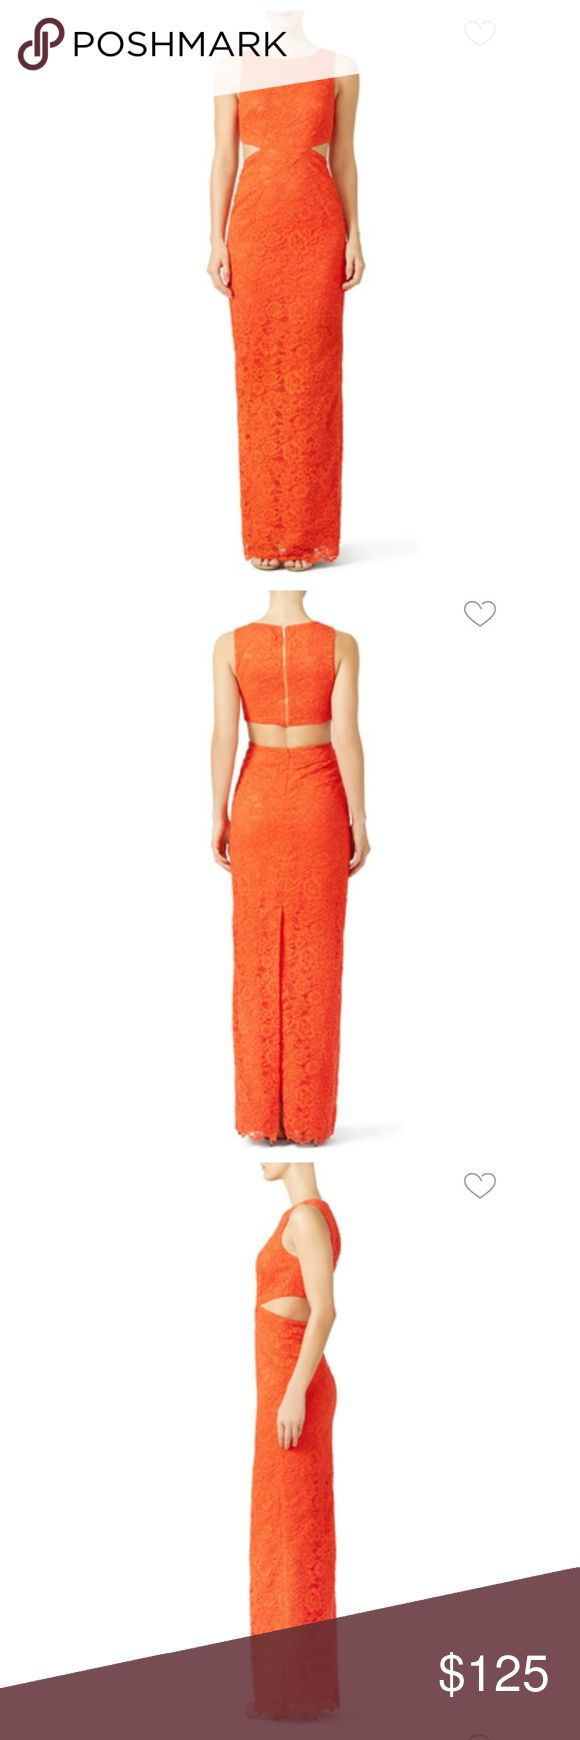 Nicole Miller orange coast gown sz 10 euc Gorgeous coral/orange color (closer to photo at black tie event). Size 10 runs small. Long length (has not been hemmed). Nicole Miller Dresses